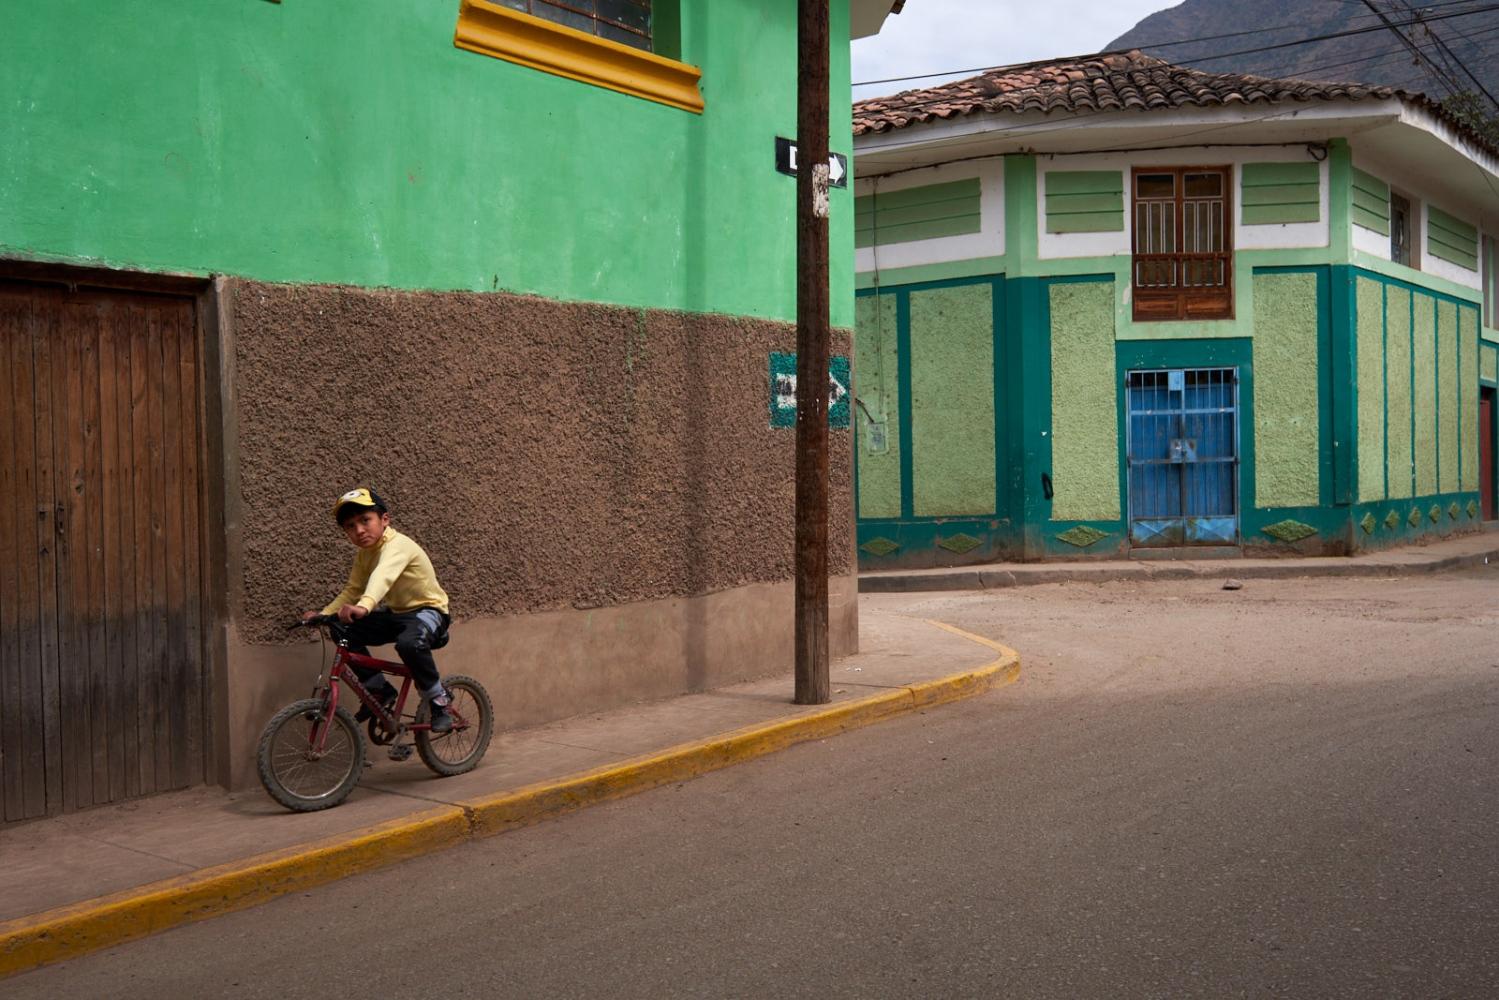 Boy on a bicycle, Calca, Peru.